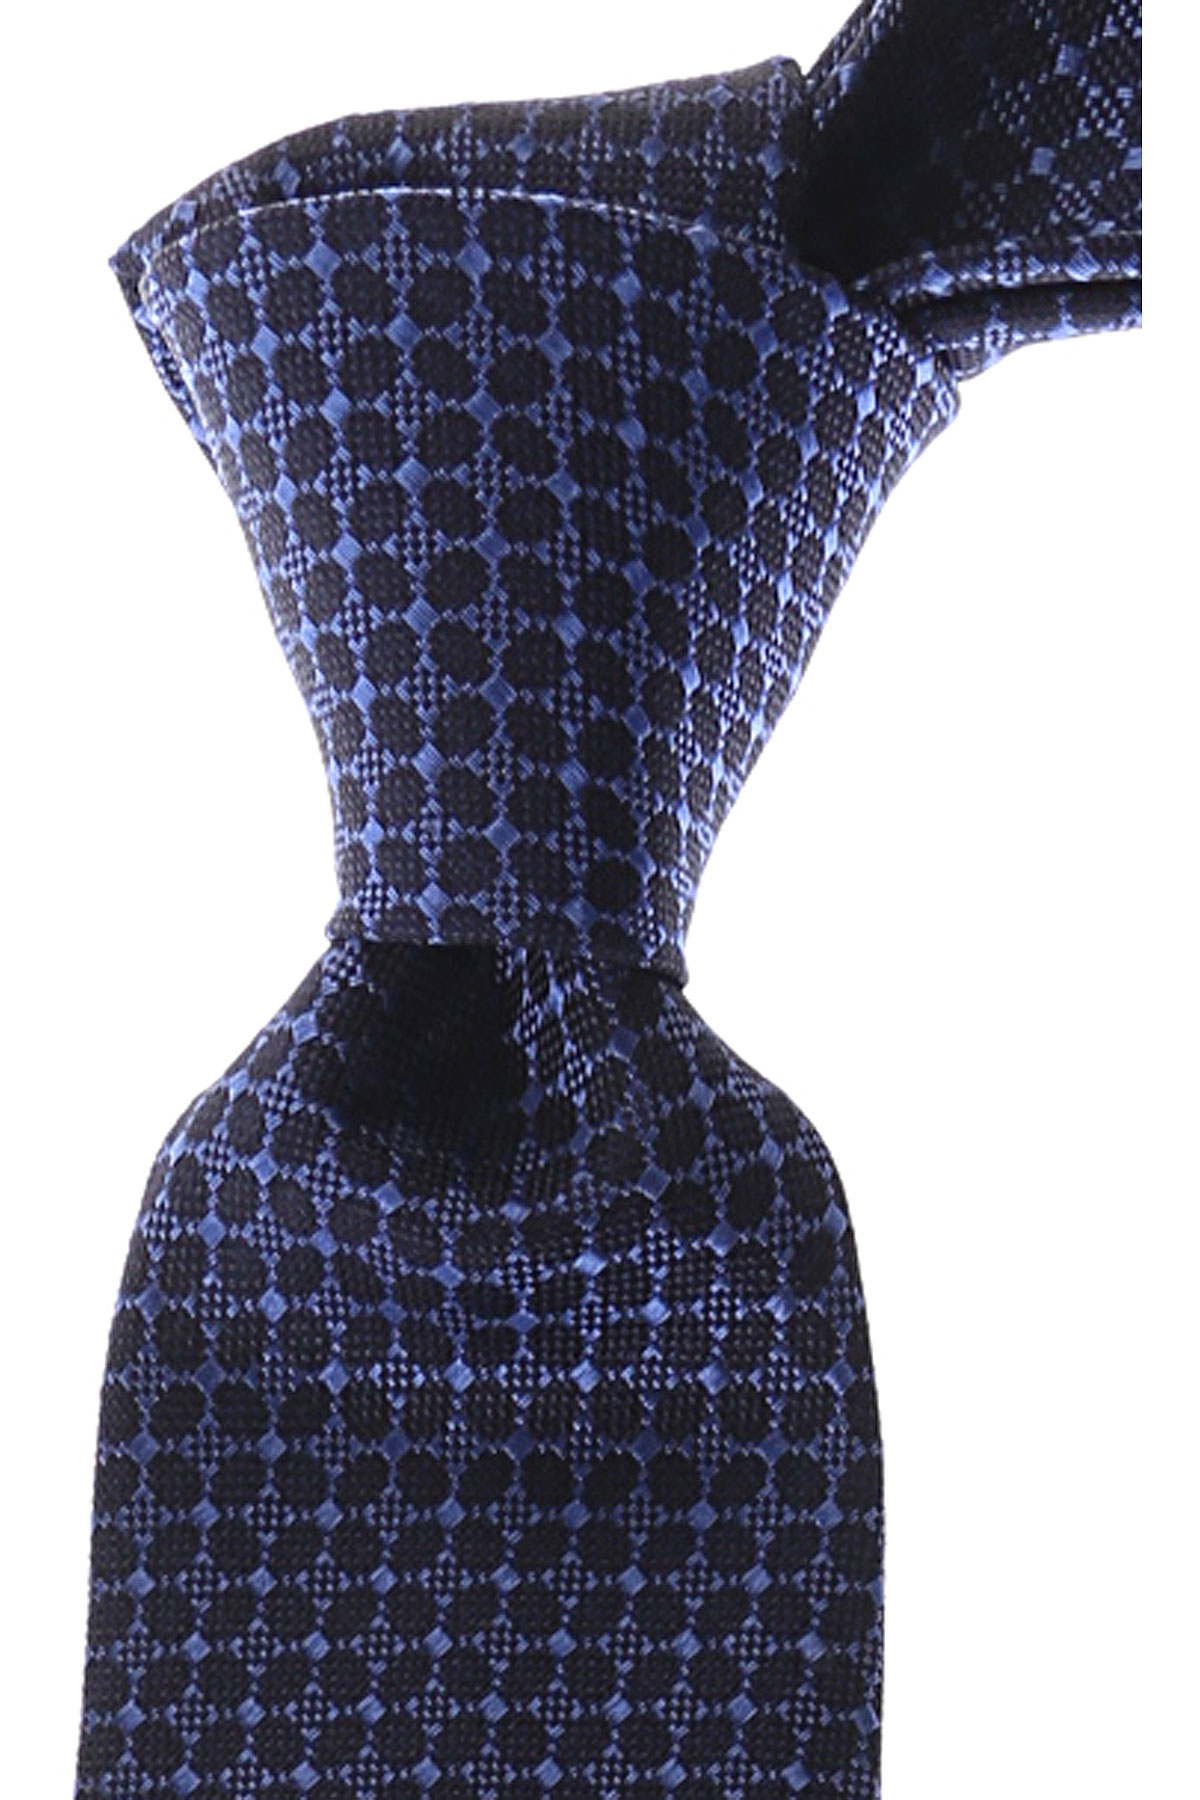 Gianni_Versace_Ties_On_Sale_Dark_Blue_Navy_Silk_2019